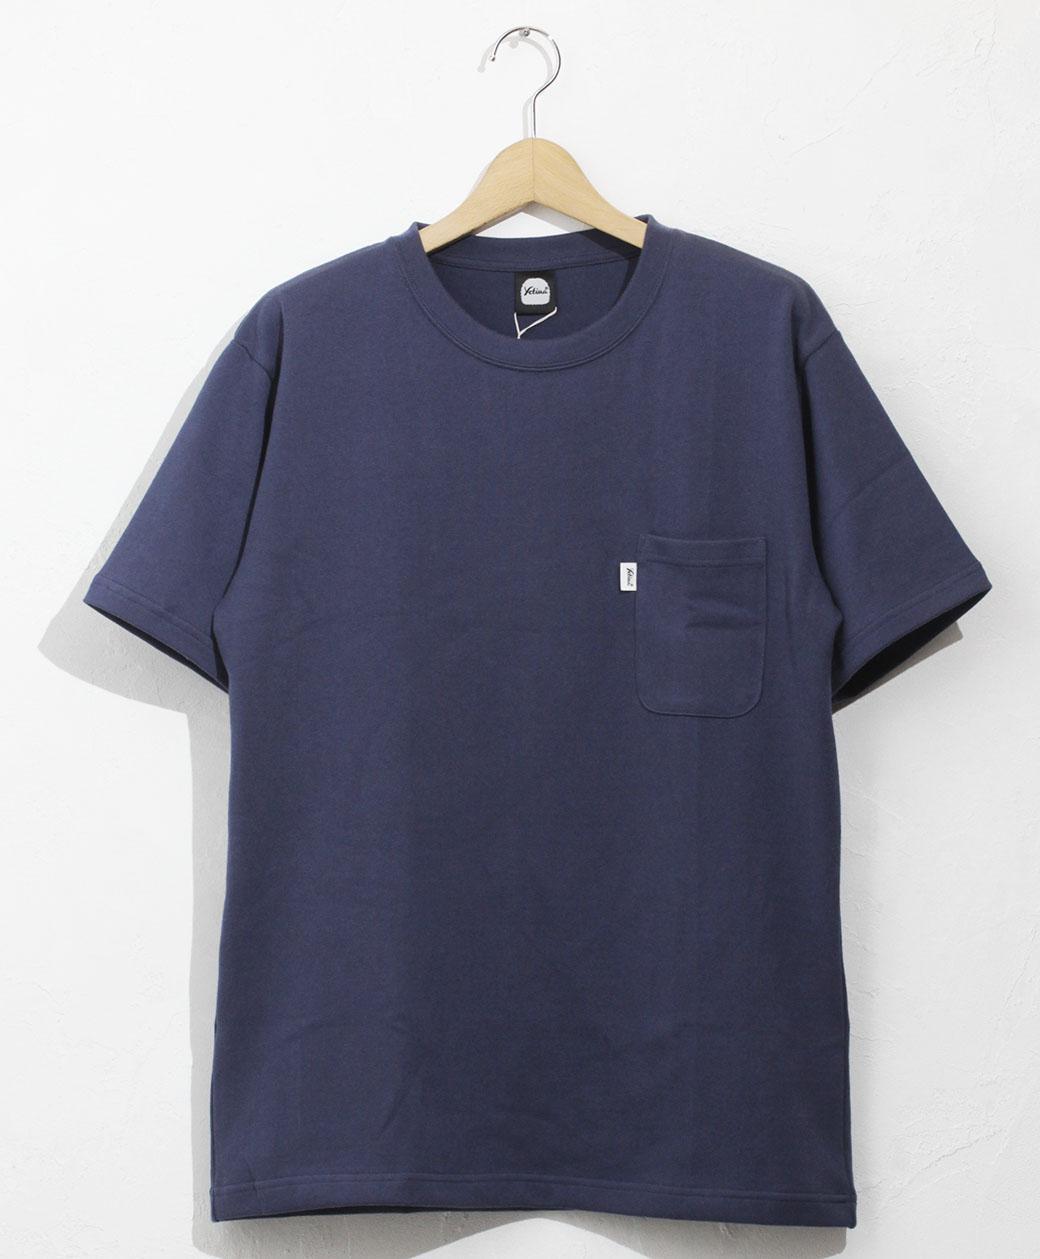 yetina heavy weight cotton pocket T-shirt(bal blue)